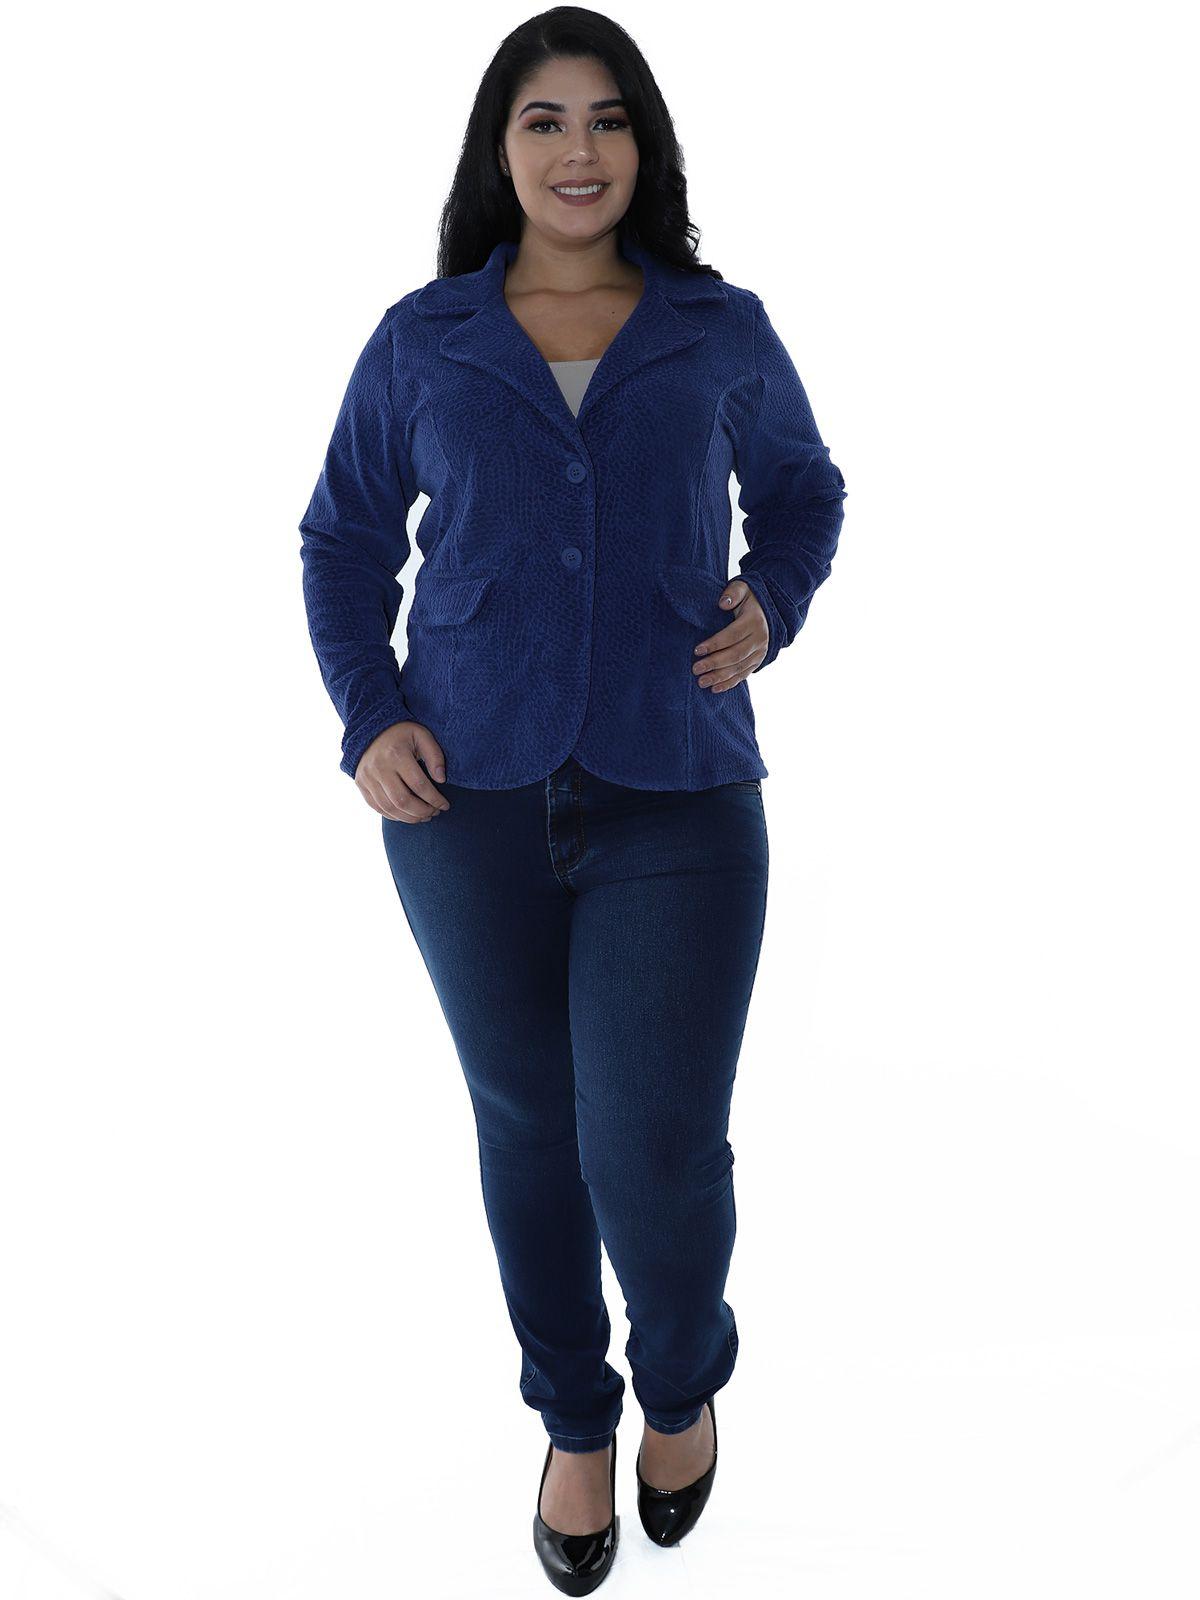 Casaco Plus Size Plush Jacquard Azul Marinho